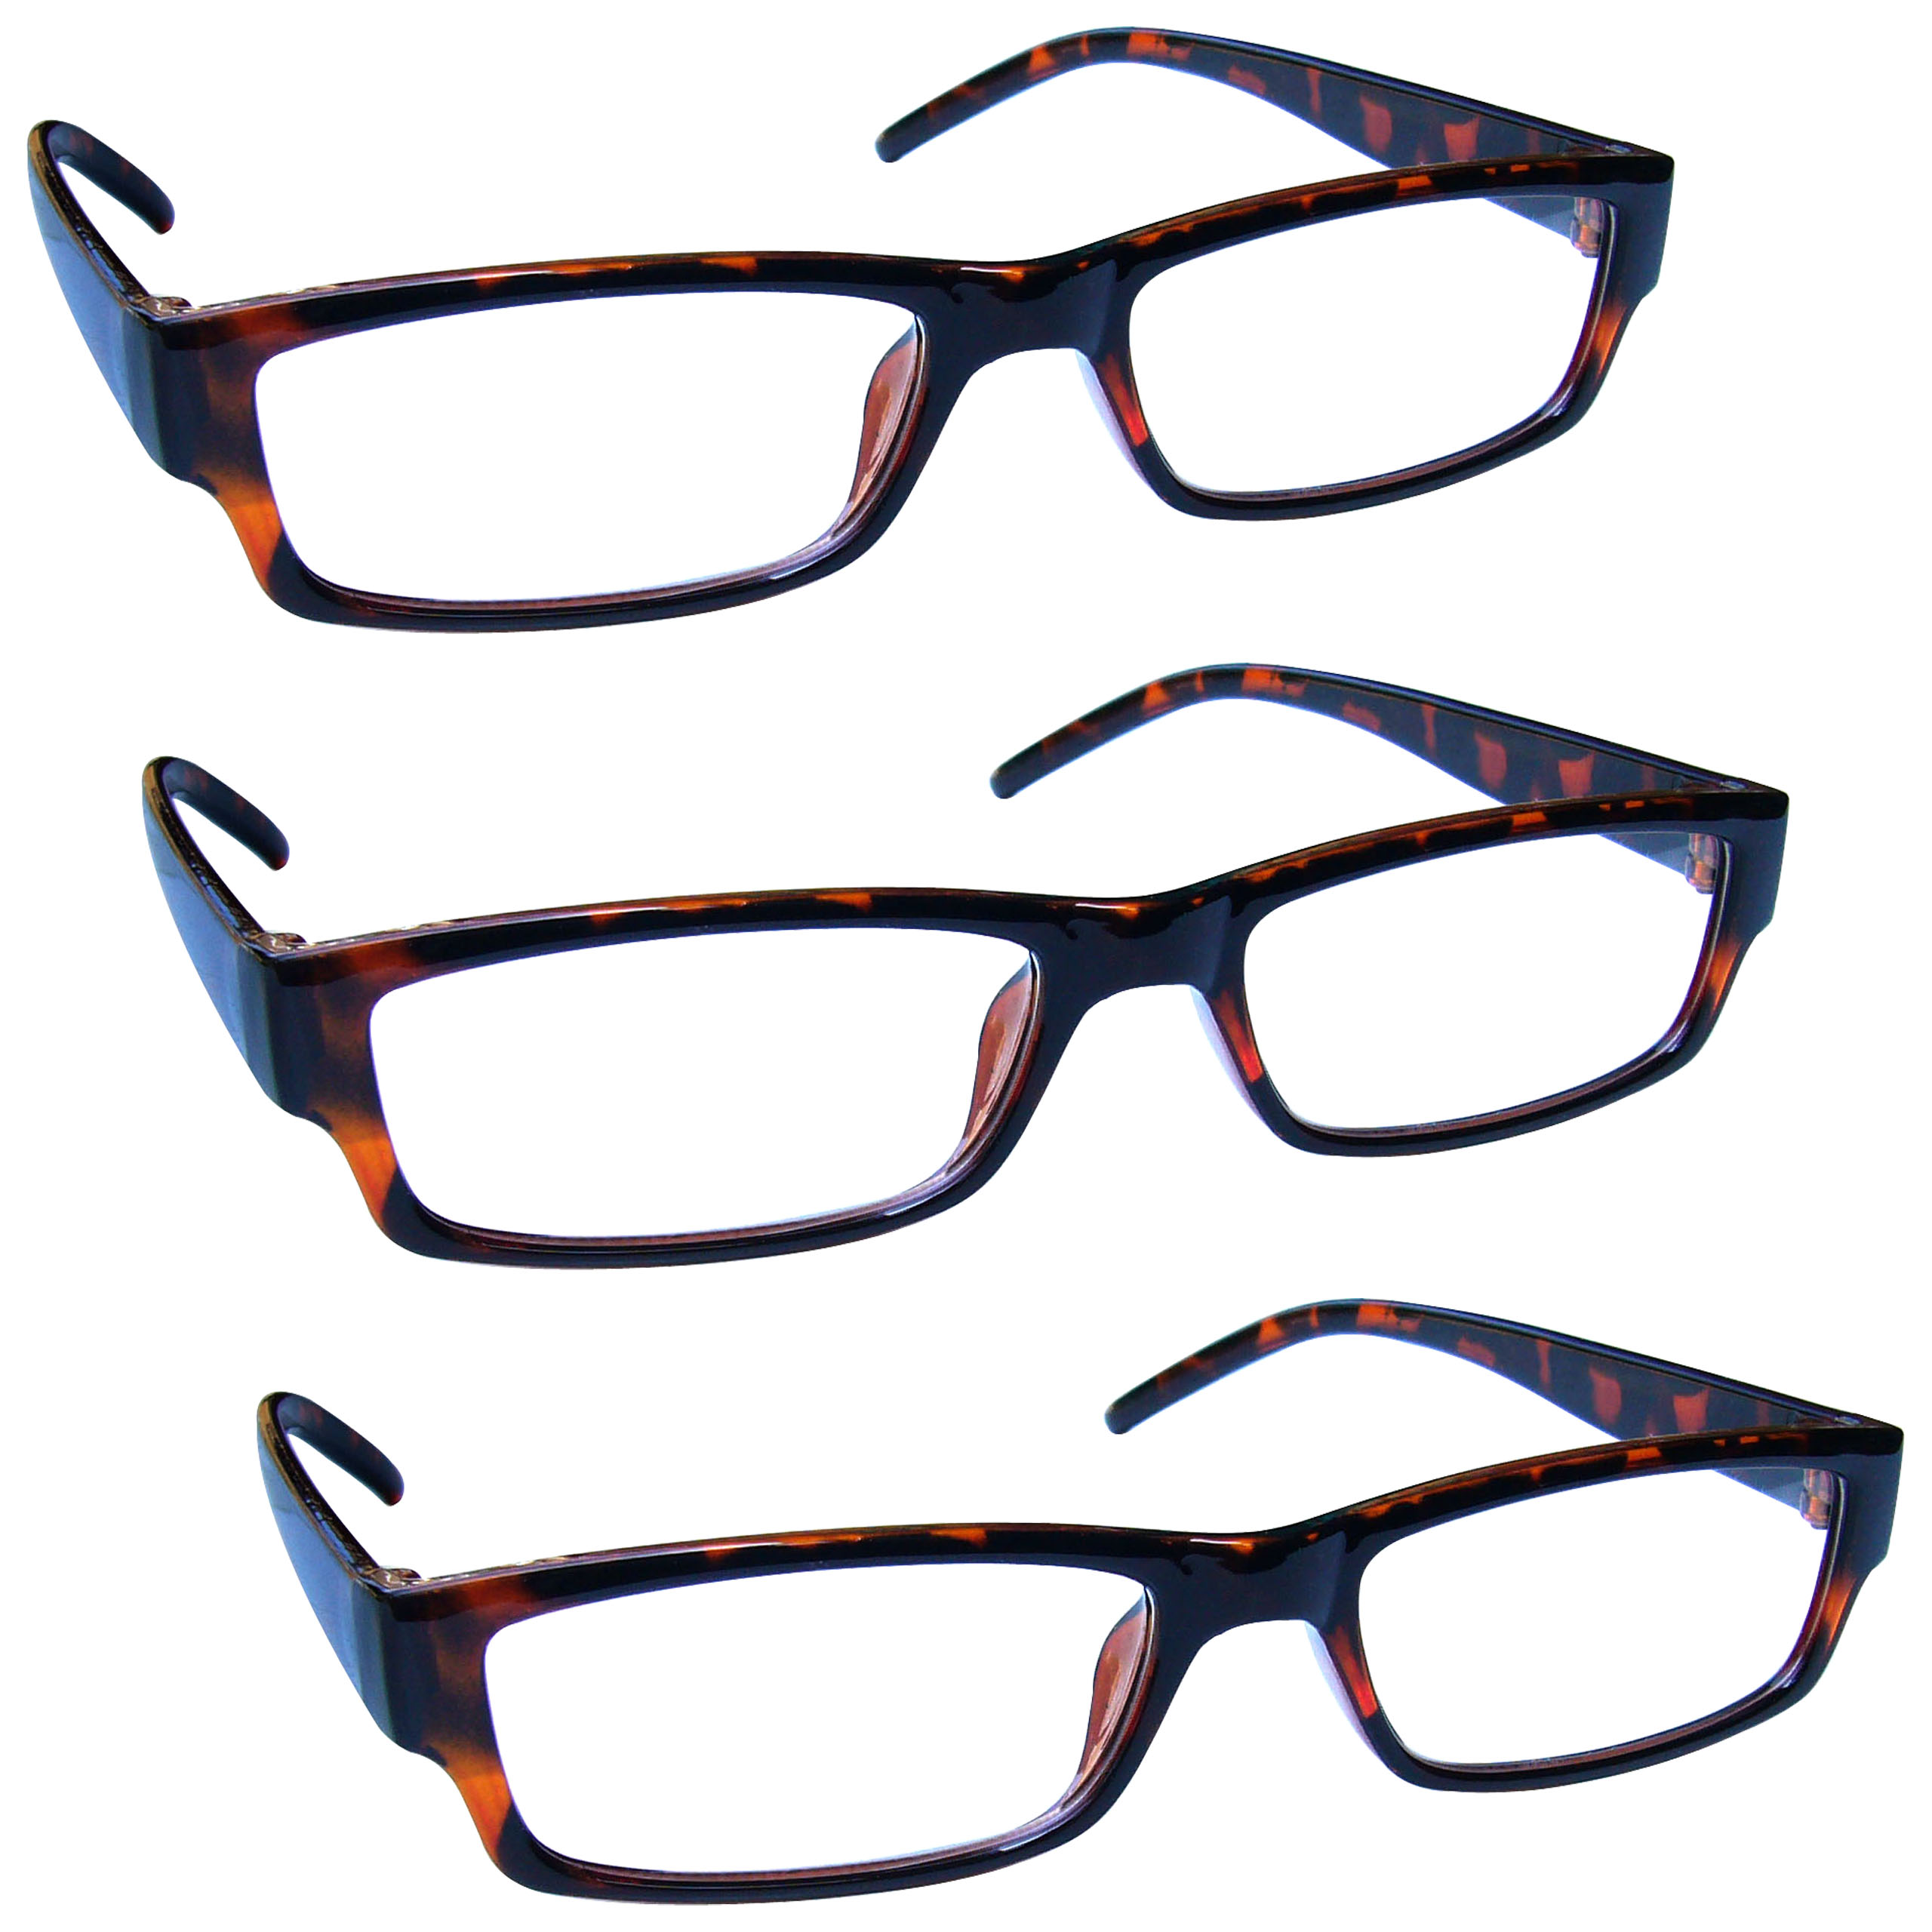 097cc550ef15 Women s Stylish Reading Glasses